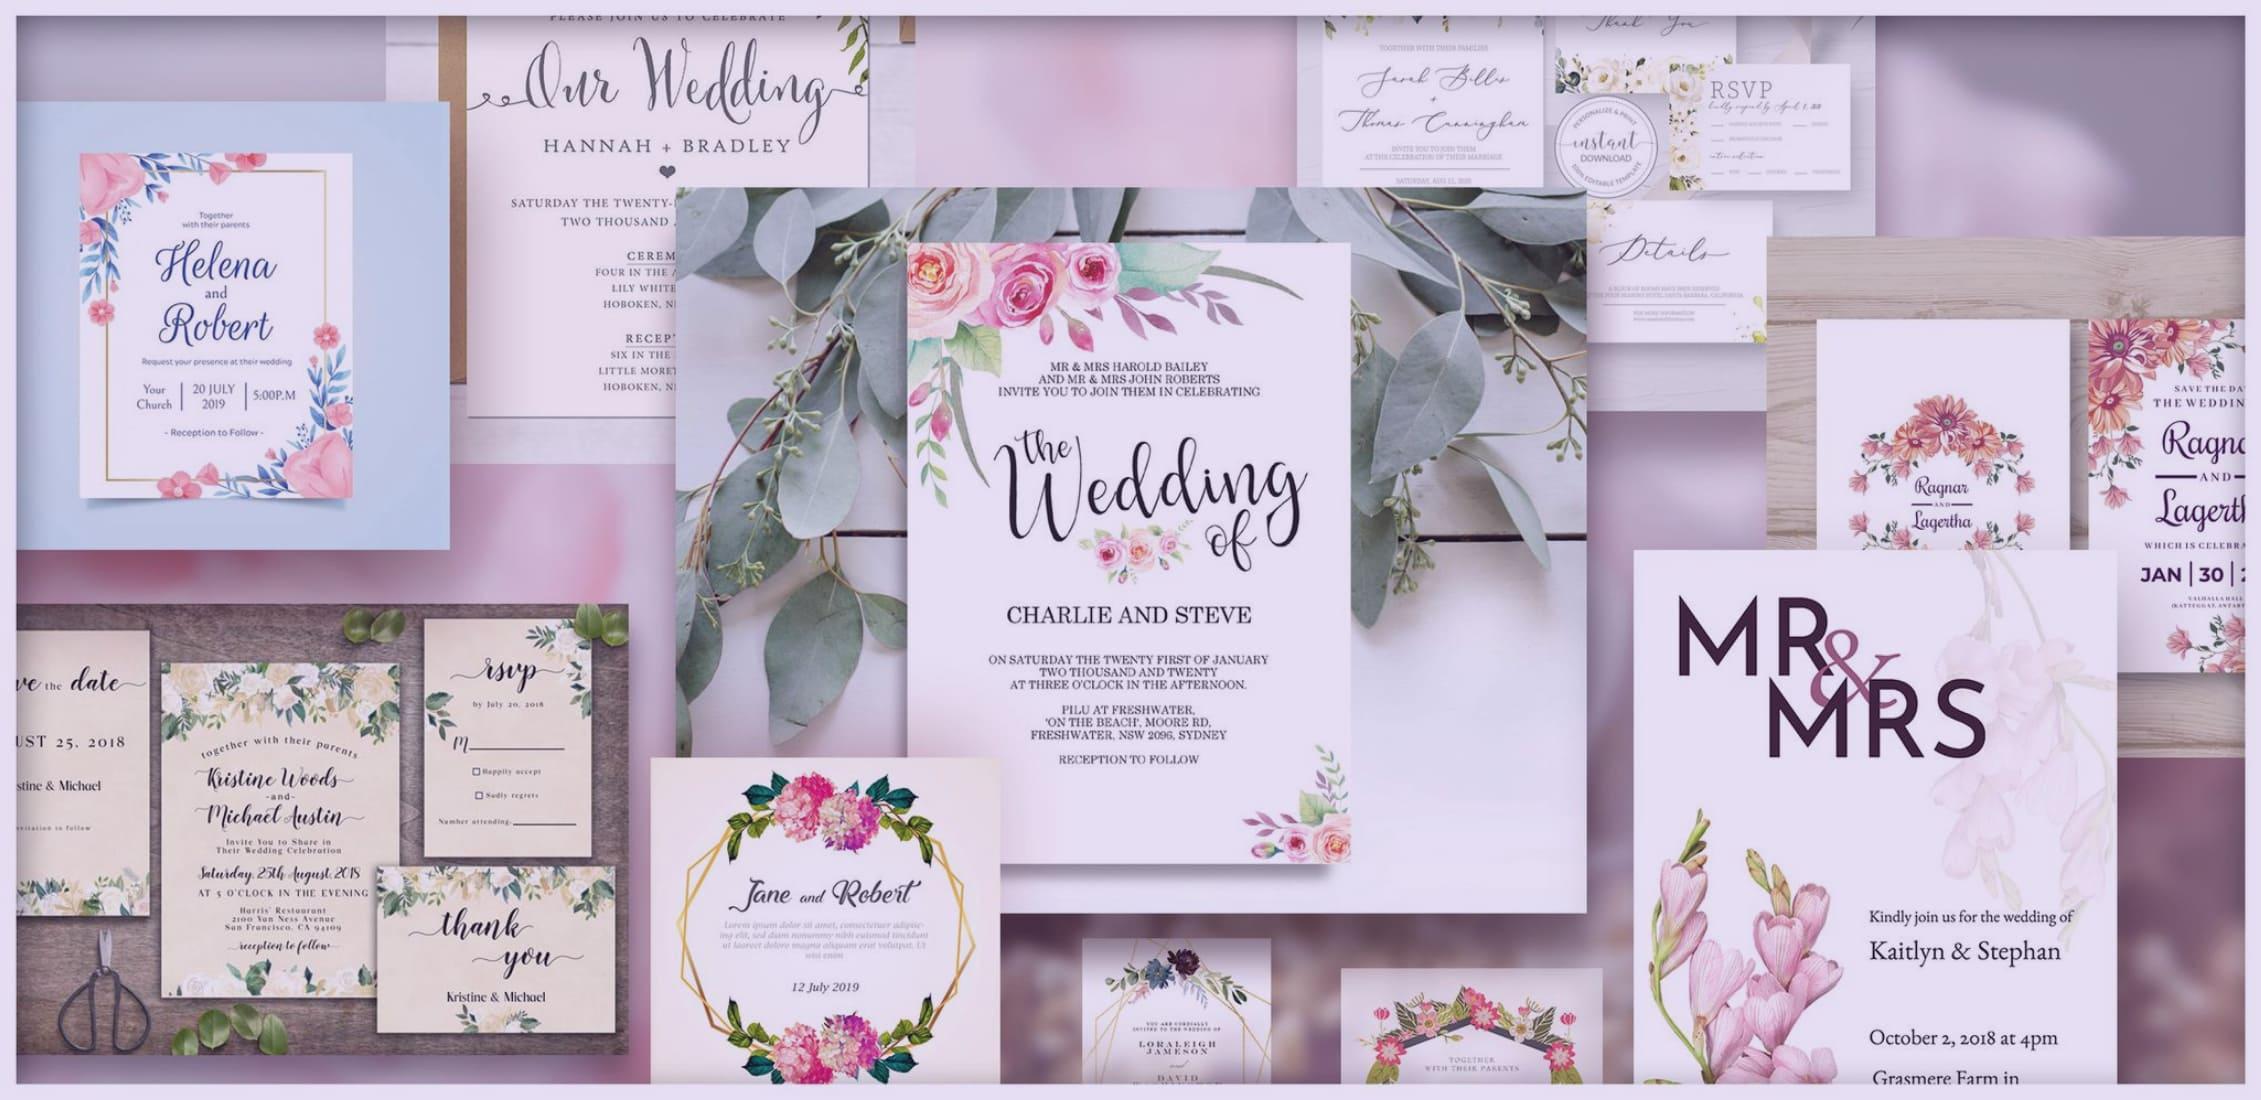 Best Wedding Invitation Templates: Free and Premium.